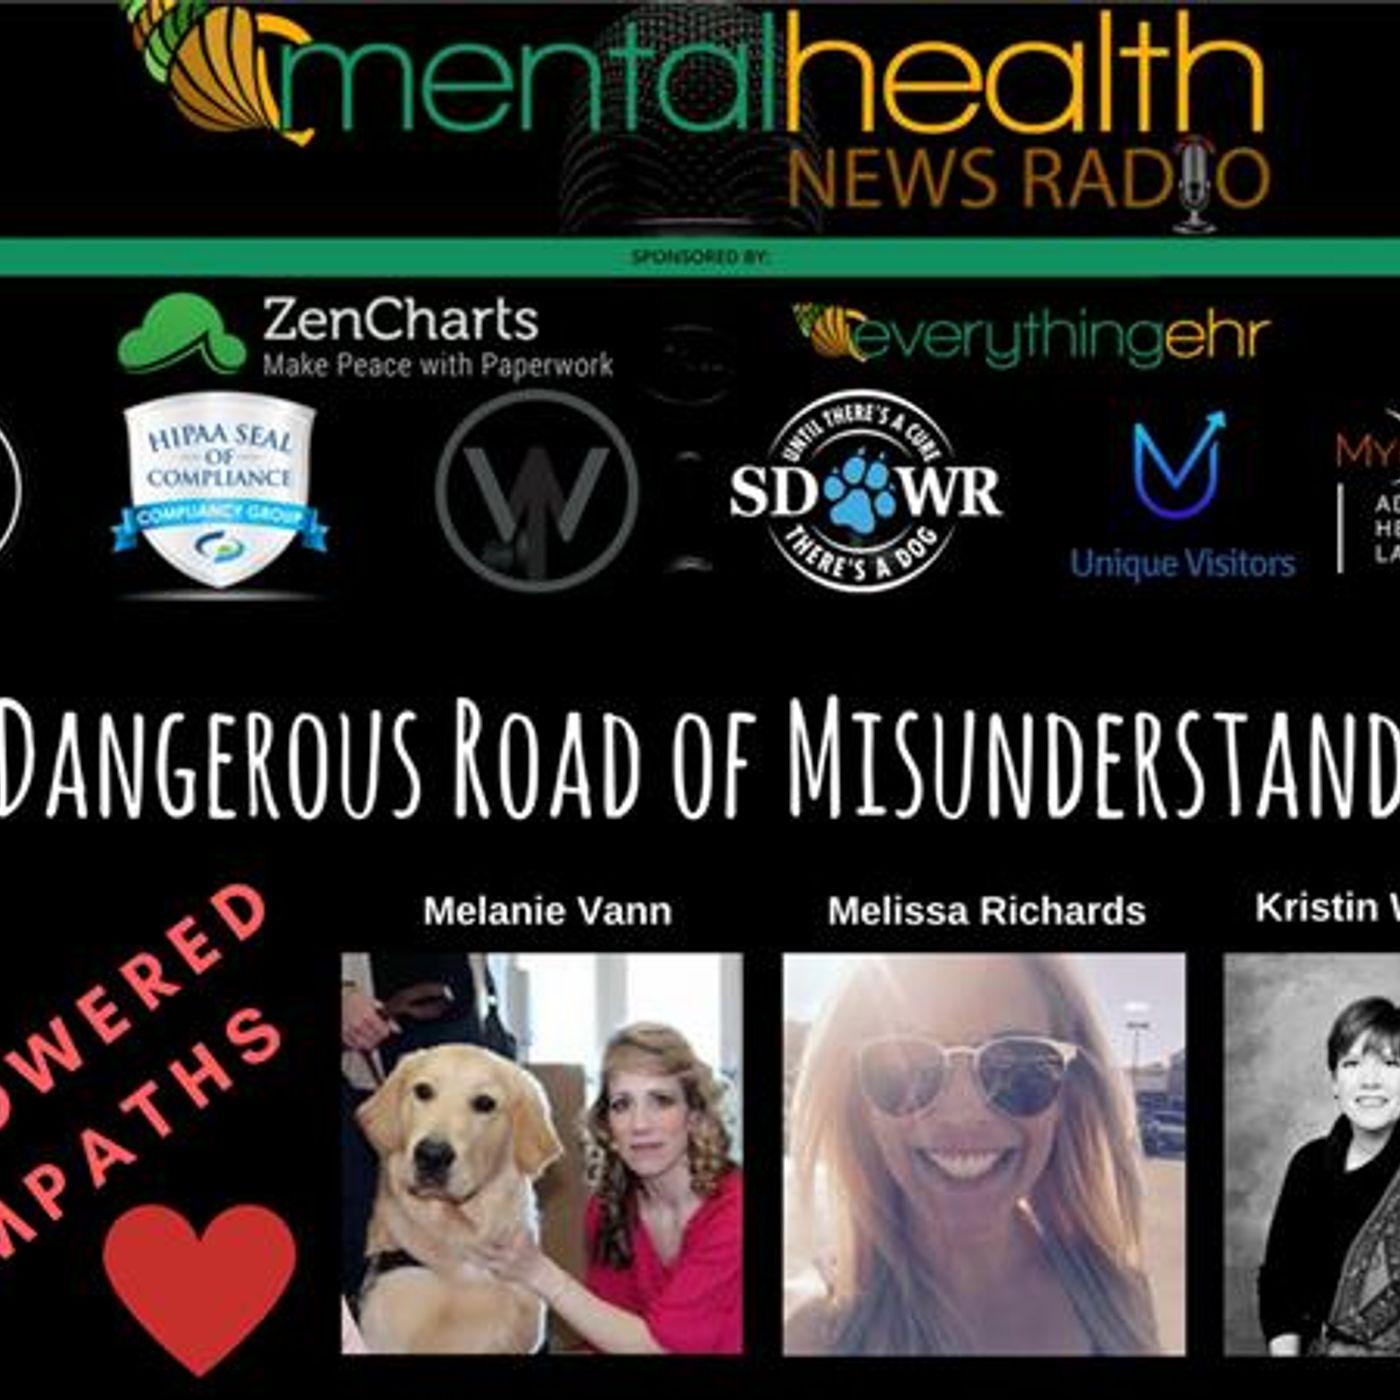 Mental Health News Radio - Empowered Empaths: The Dangerous Road of Misunderstanding